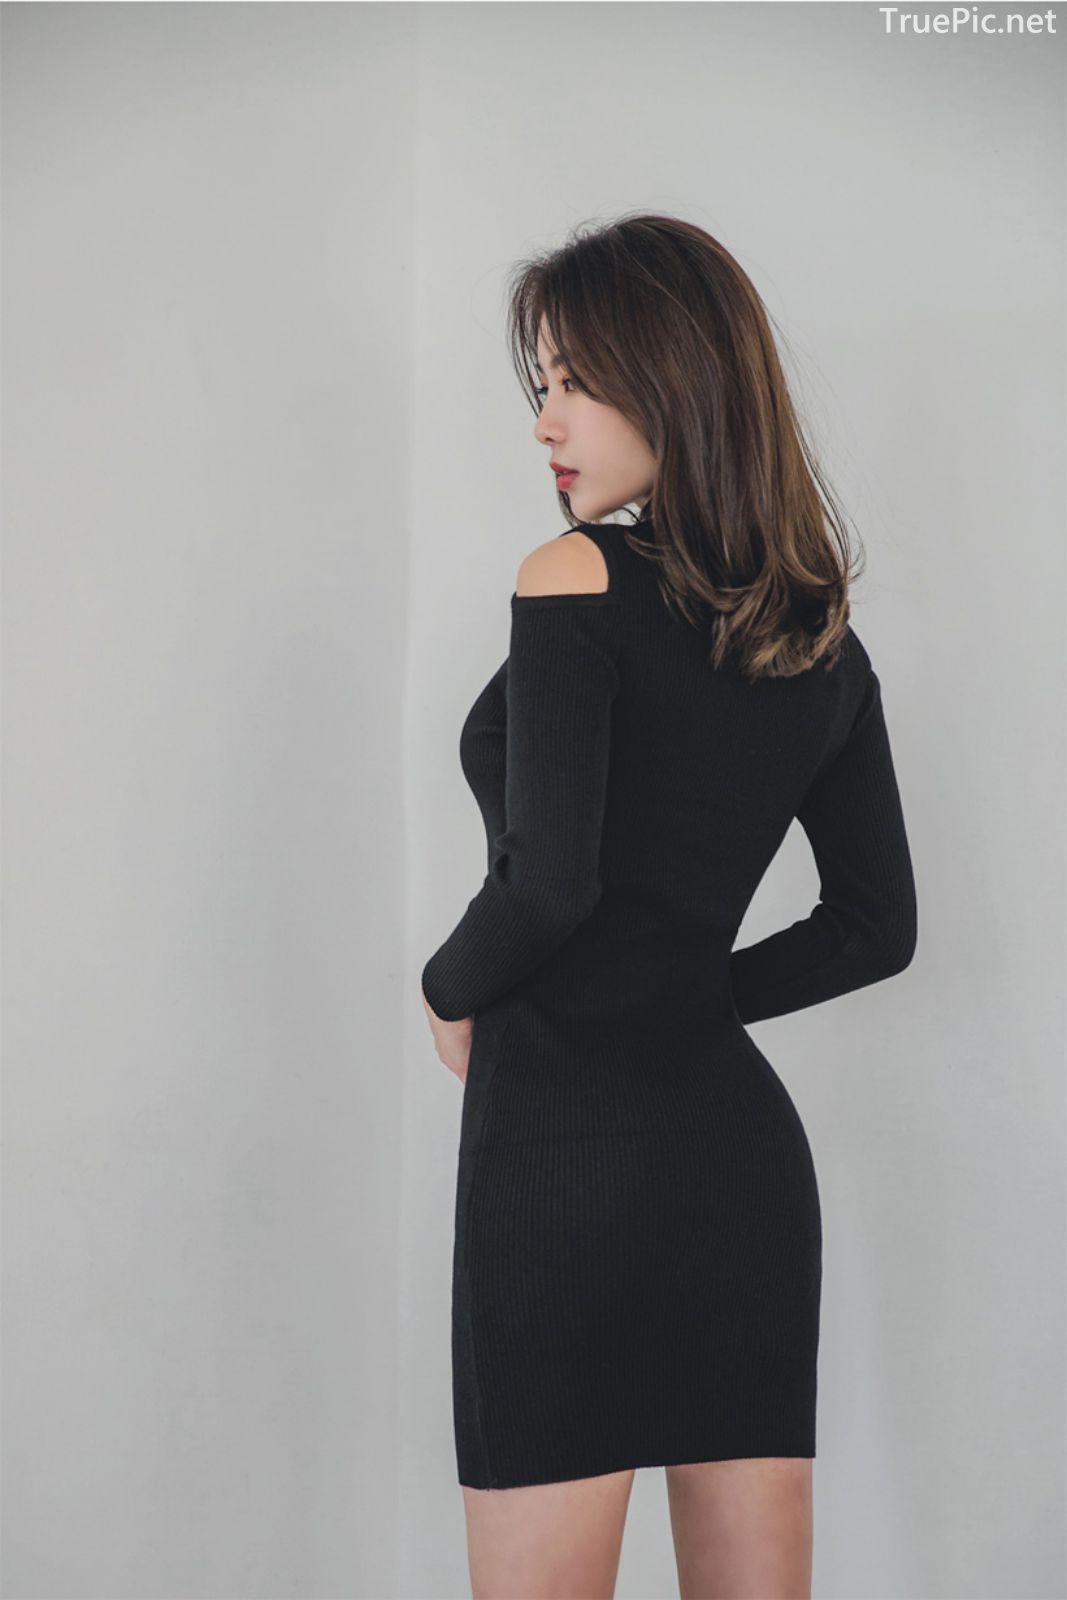 Korean fashion model - An Seo Rin - Woolen office dress collection - TruePic.net - Picture 4